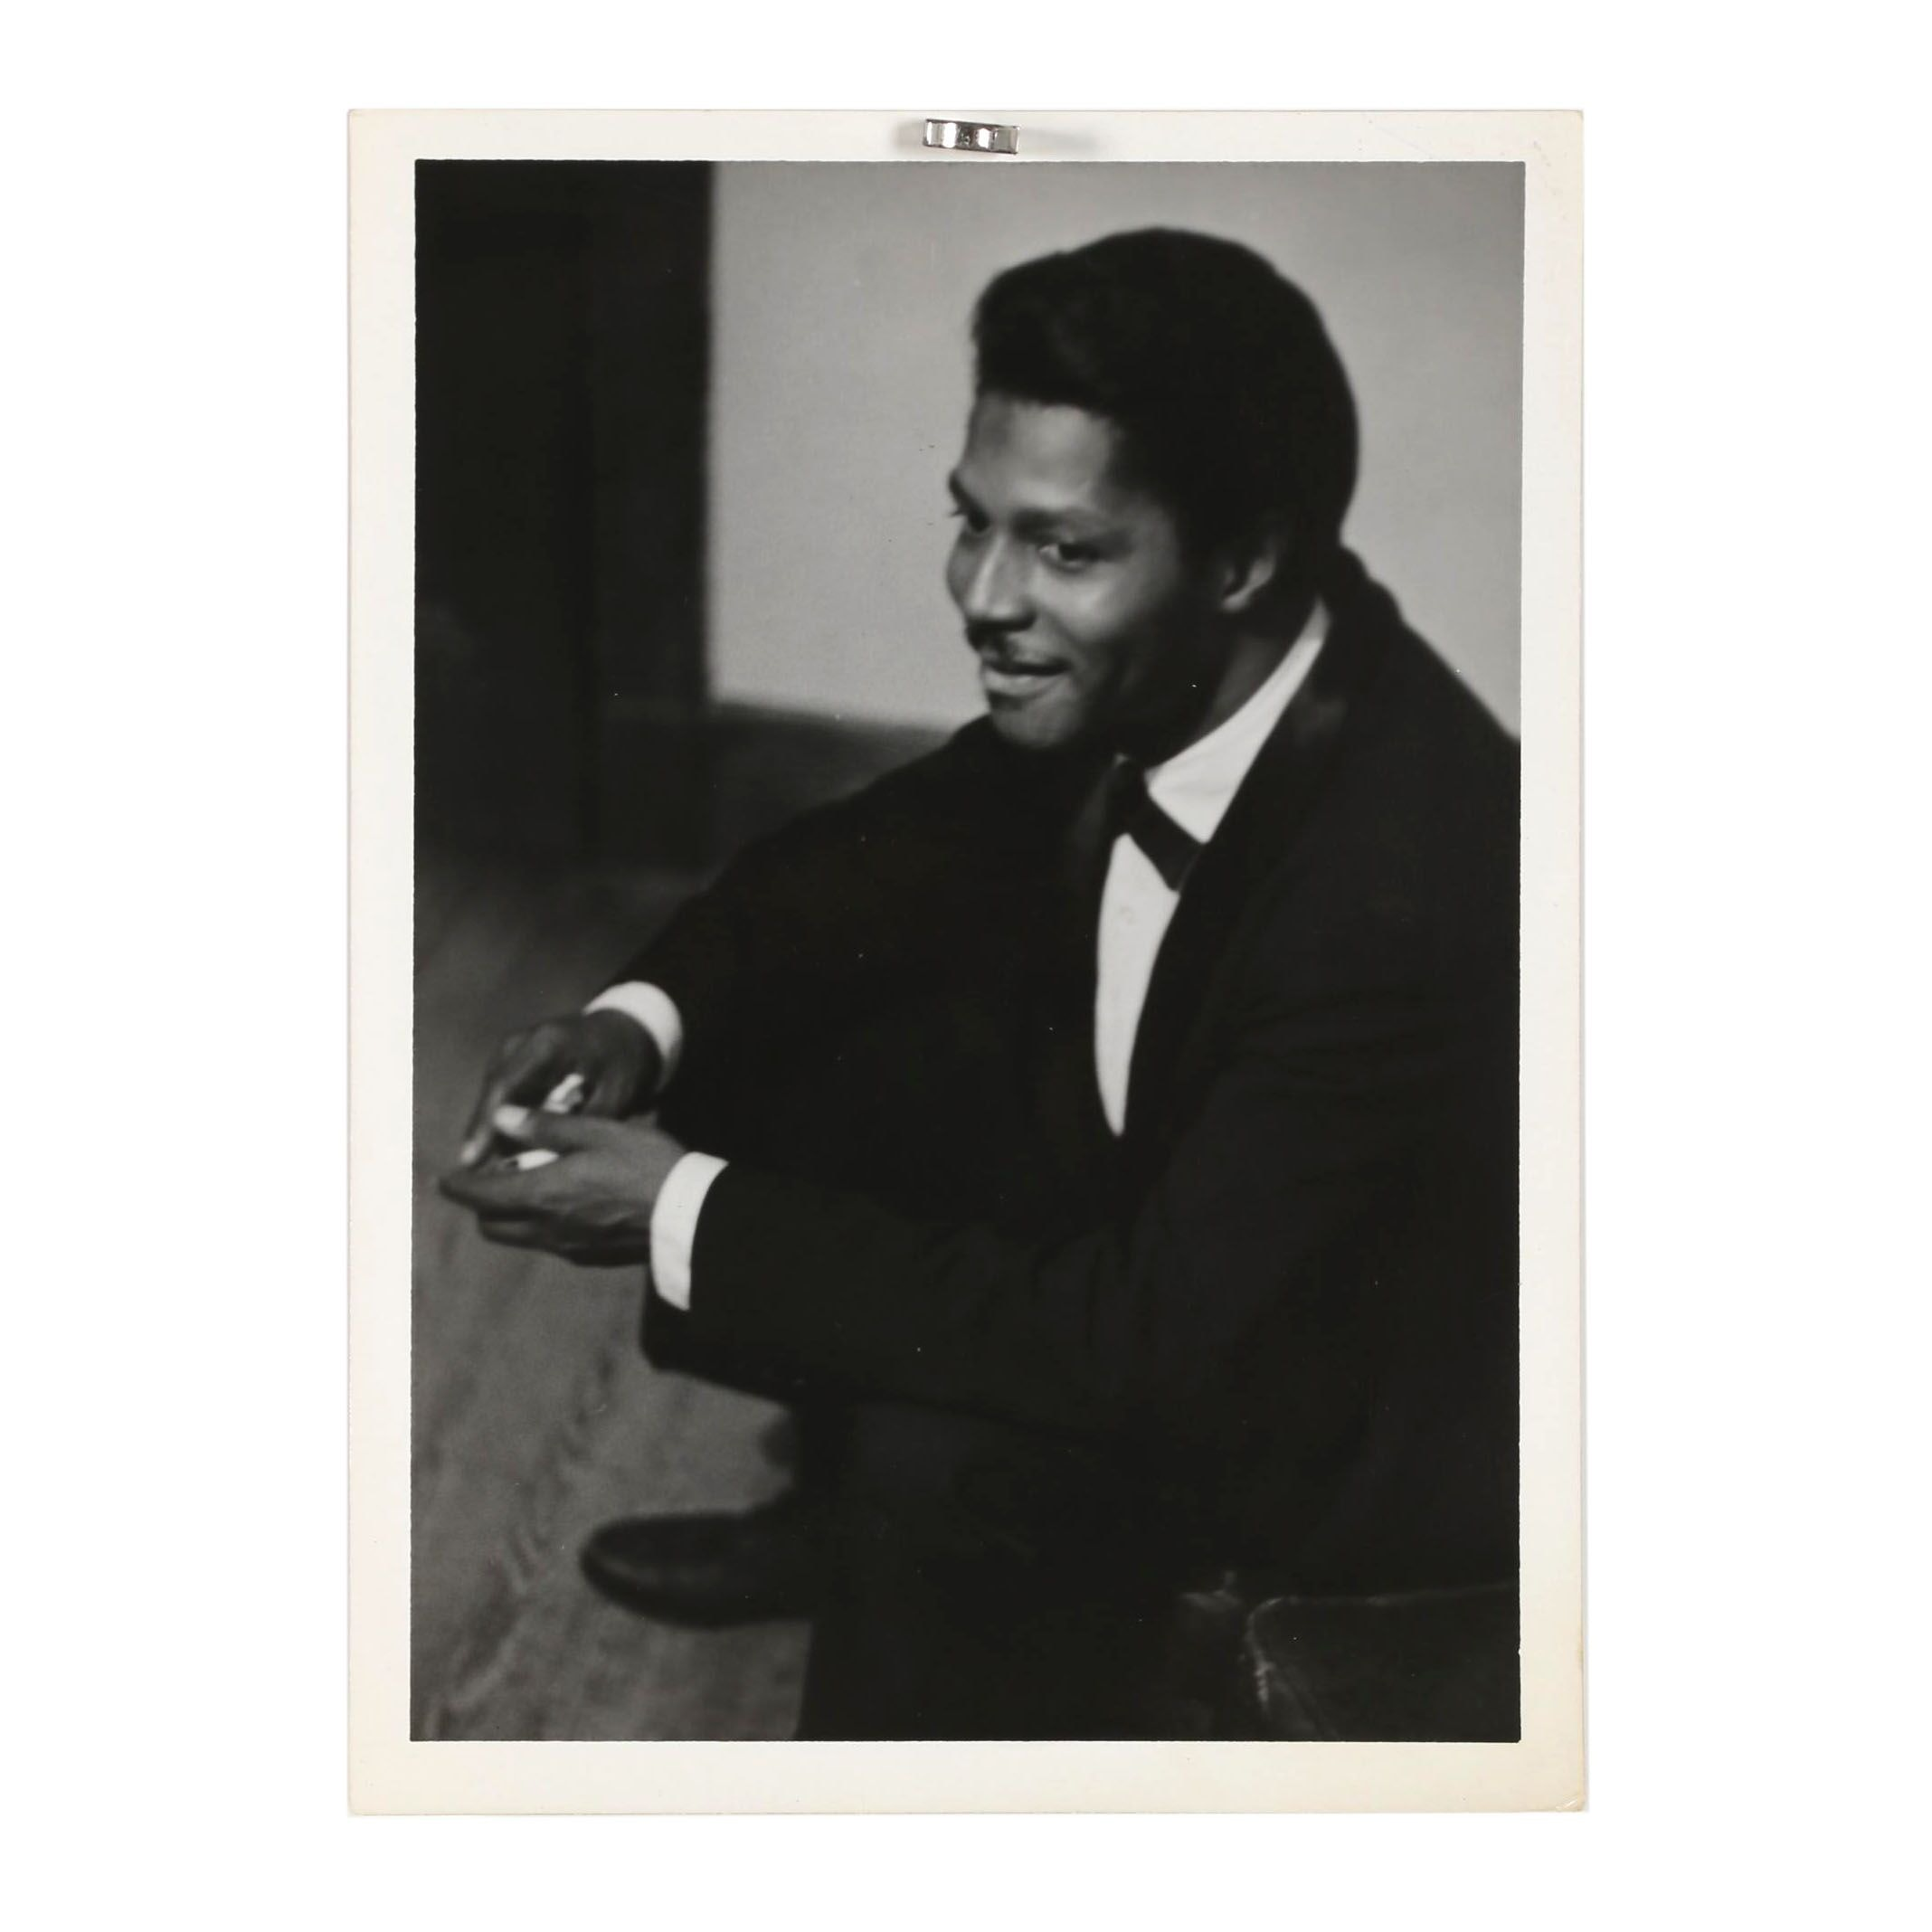 Jack Bradley Silver Gelatin Photograph of Willie Cook